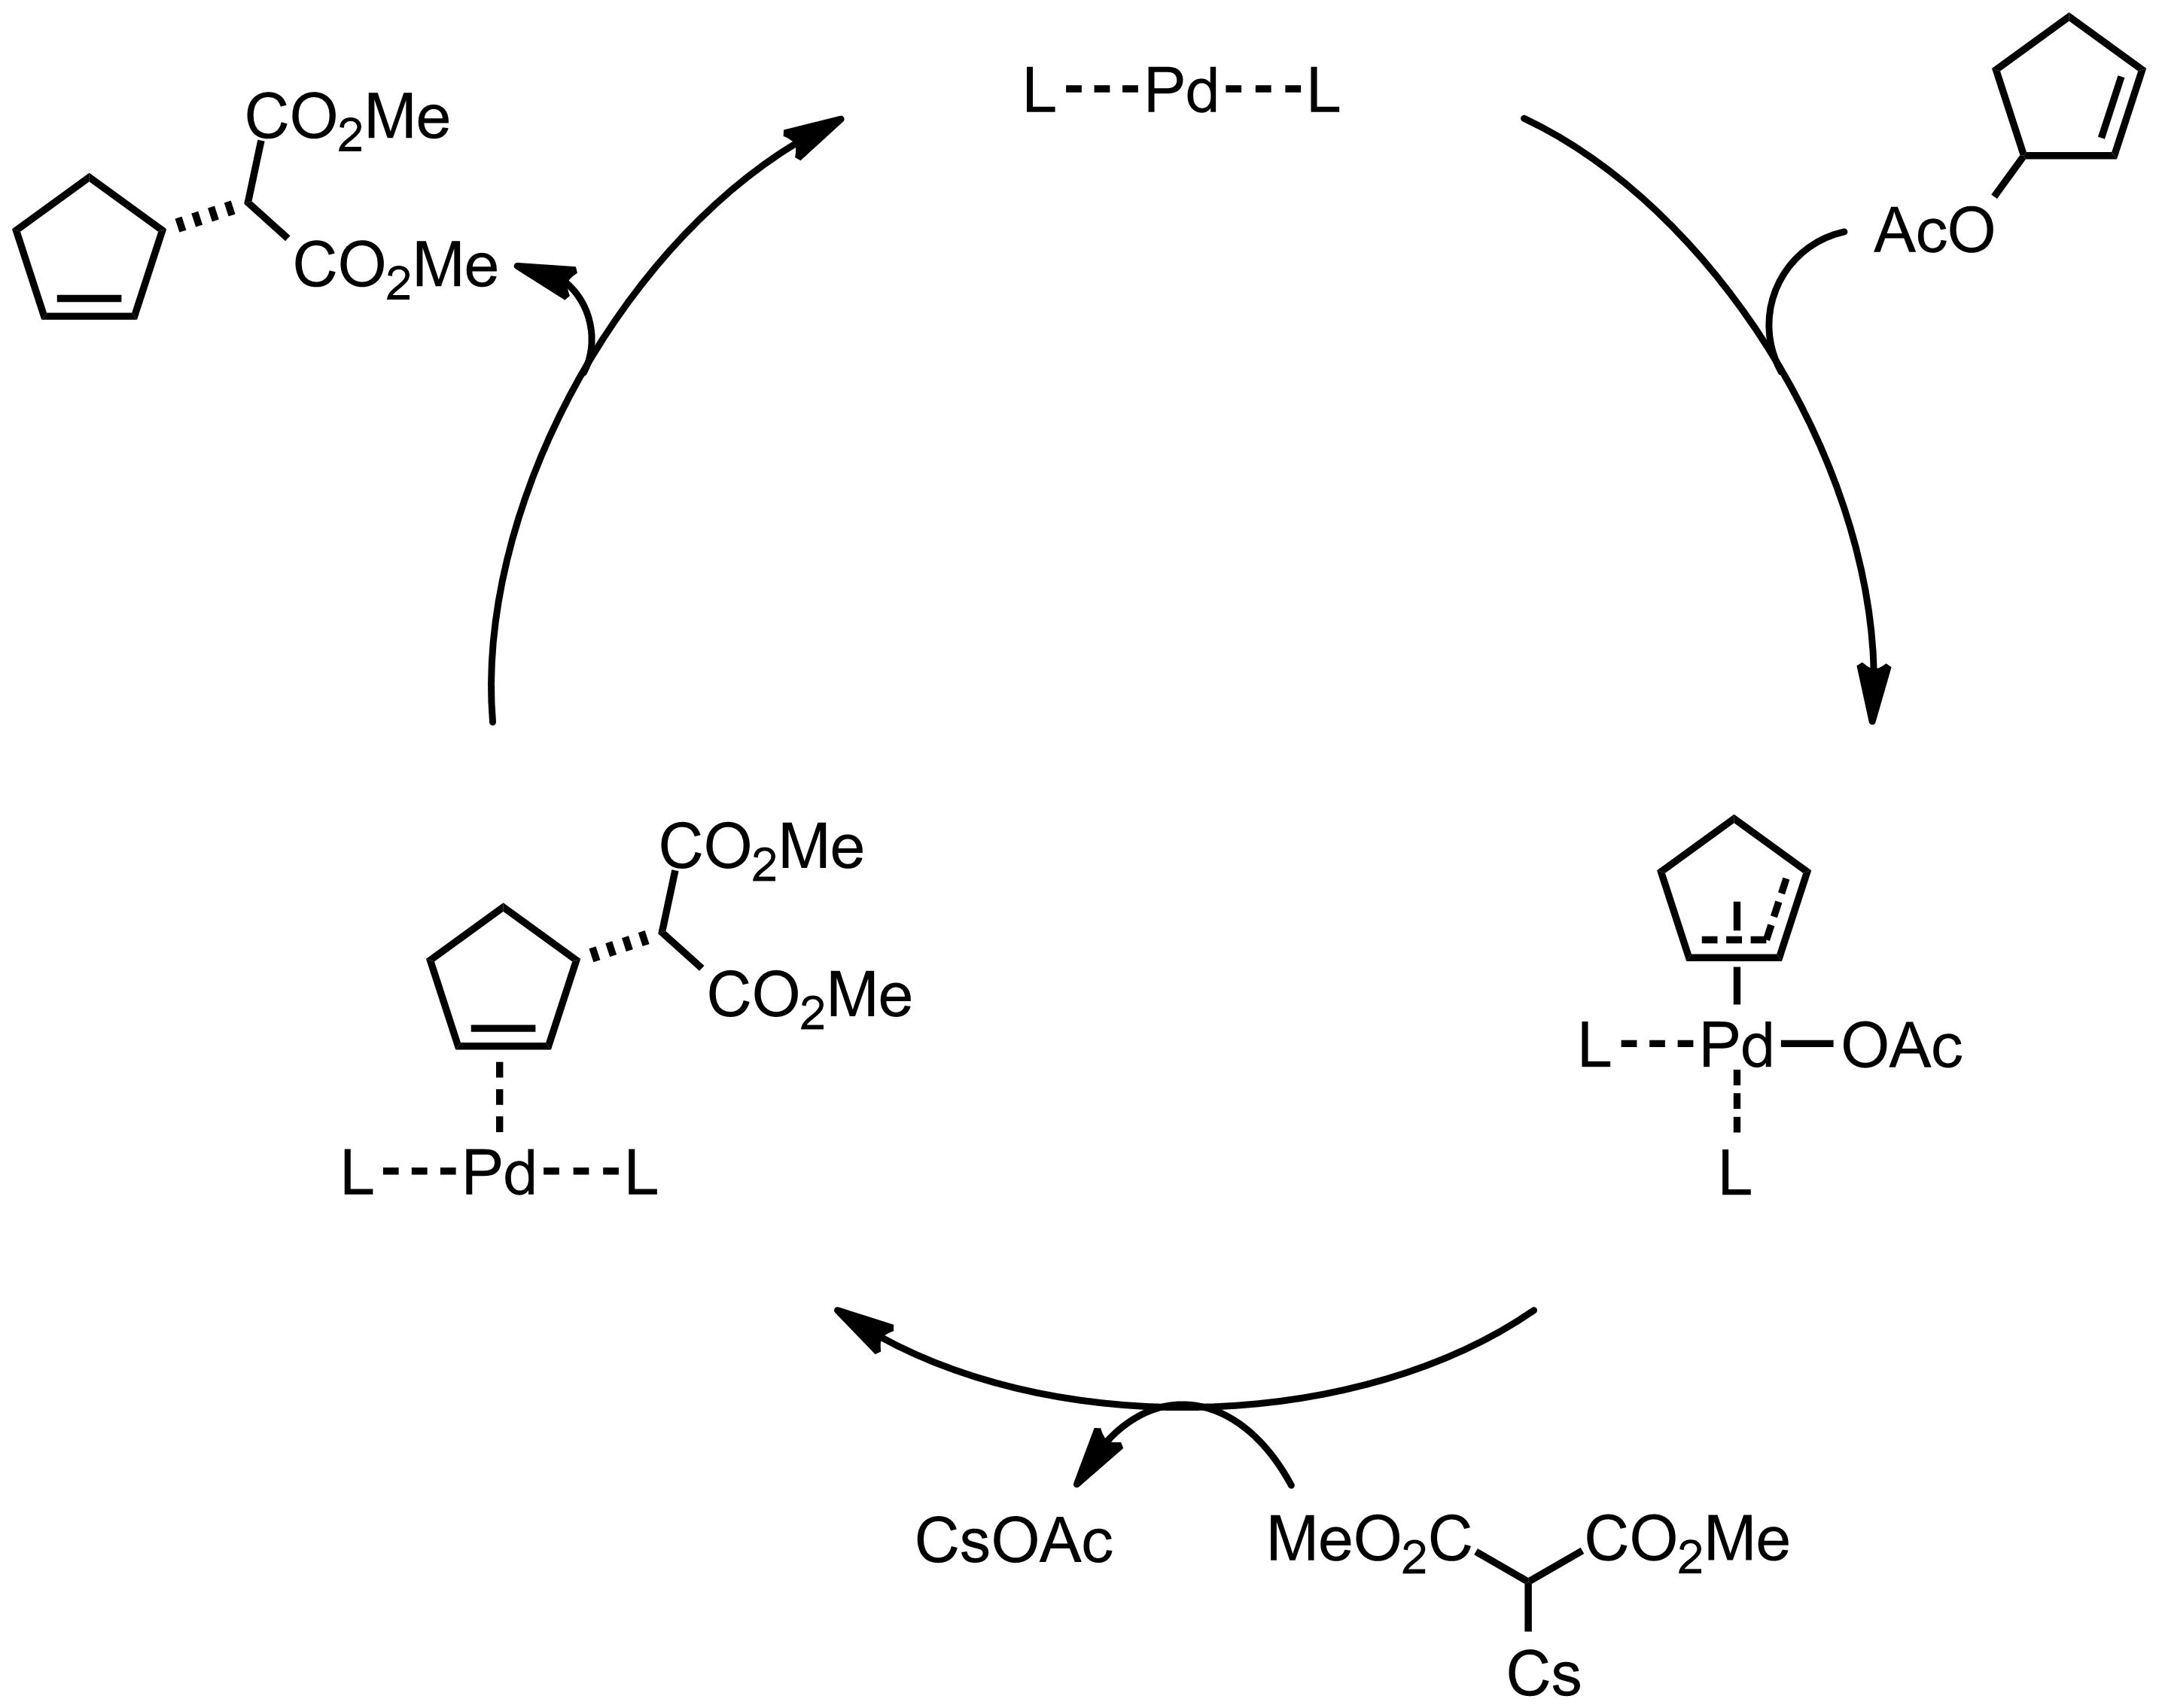 Mechanism of the Trost Asymmetic Allylation Alkylation